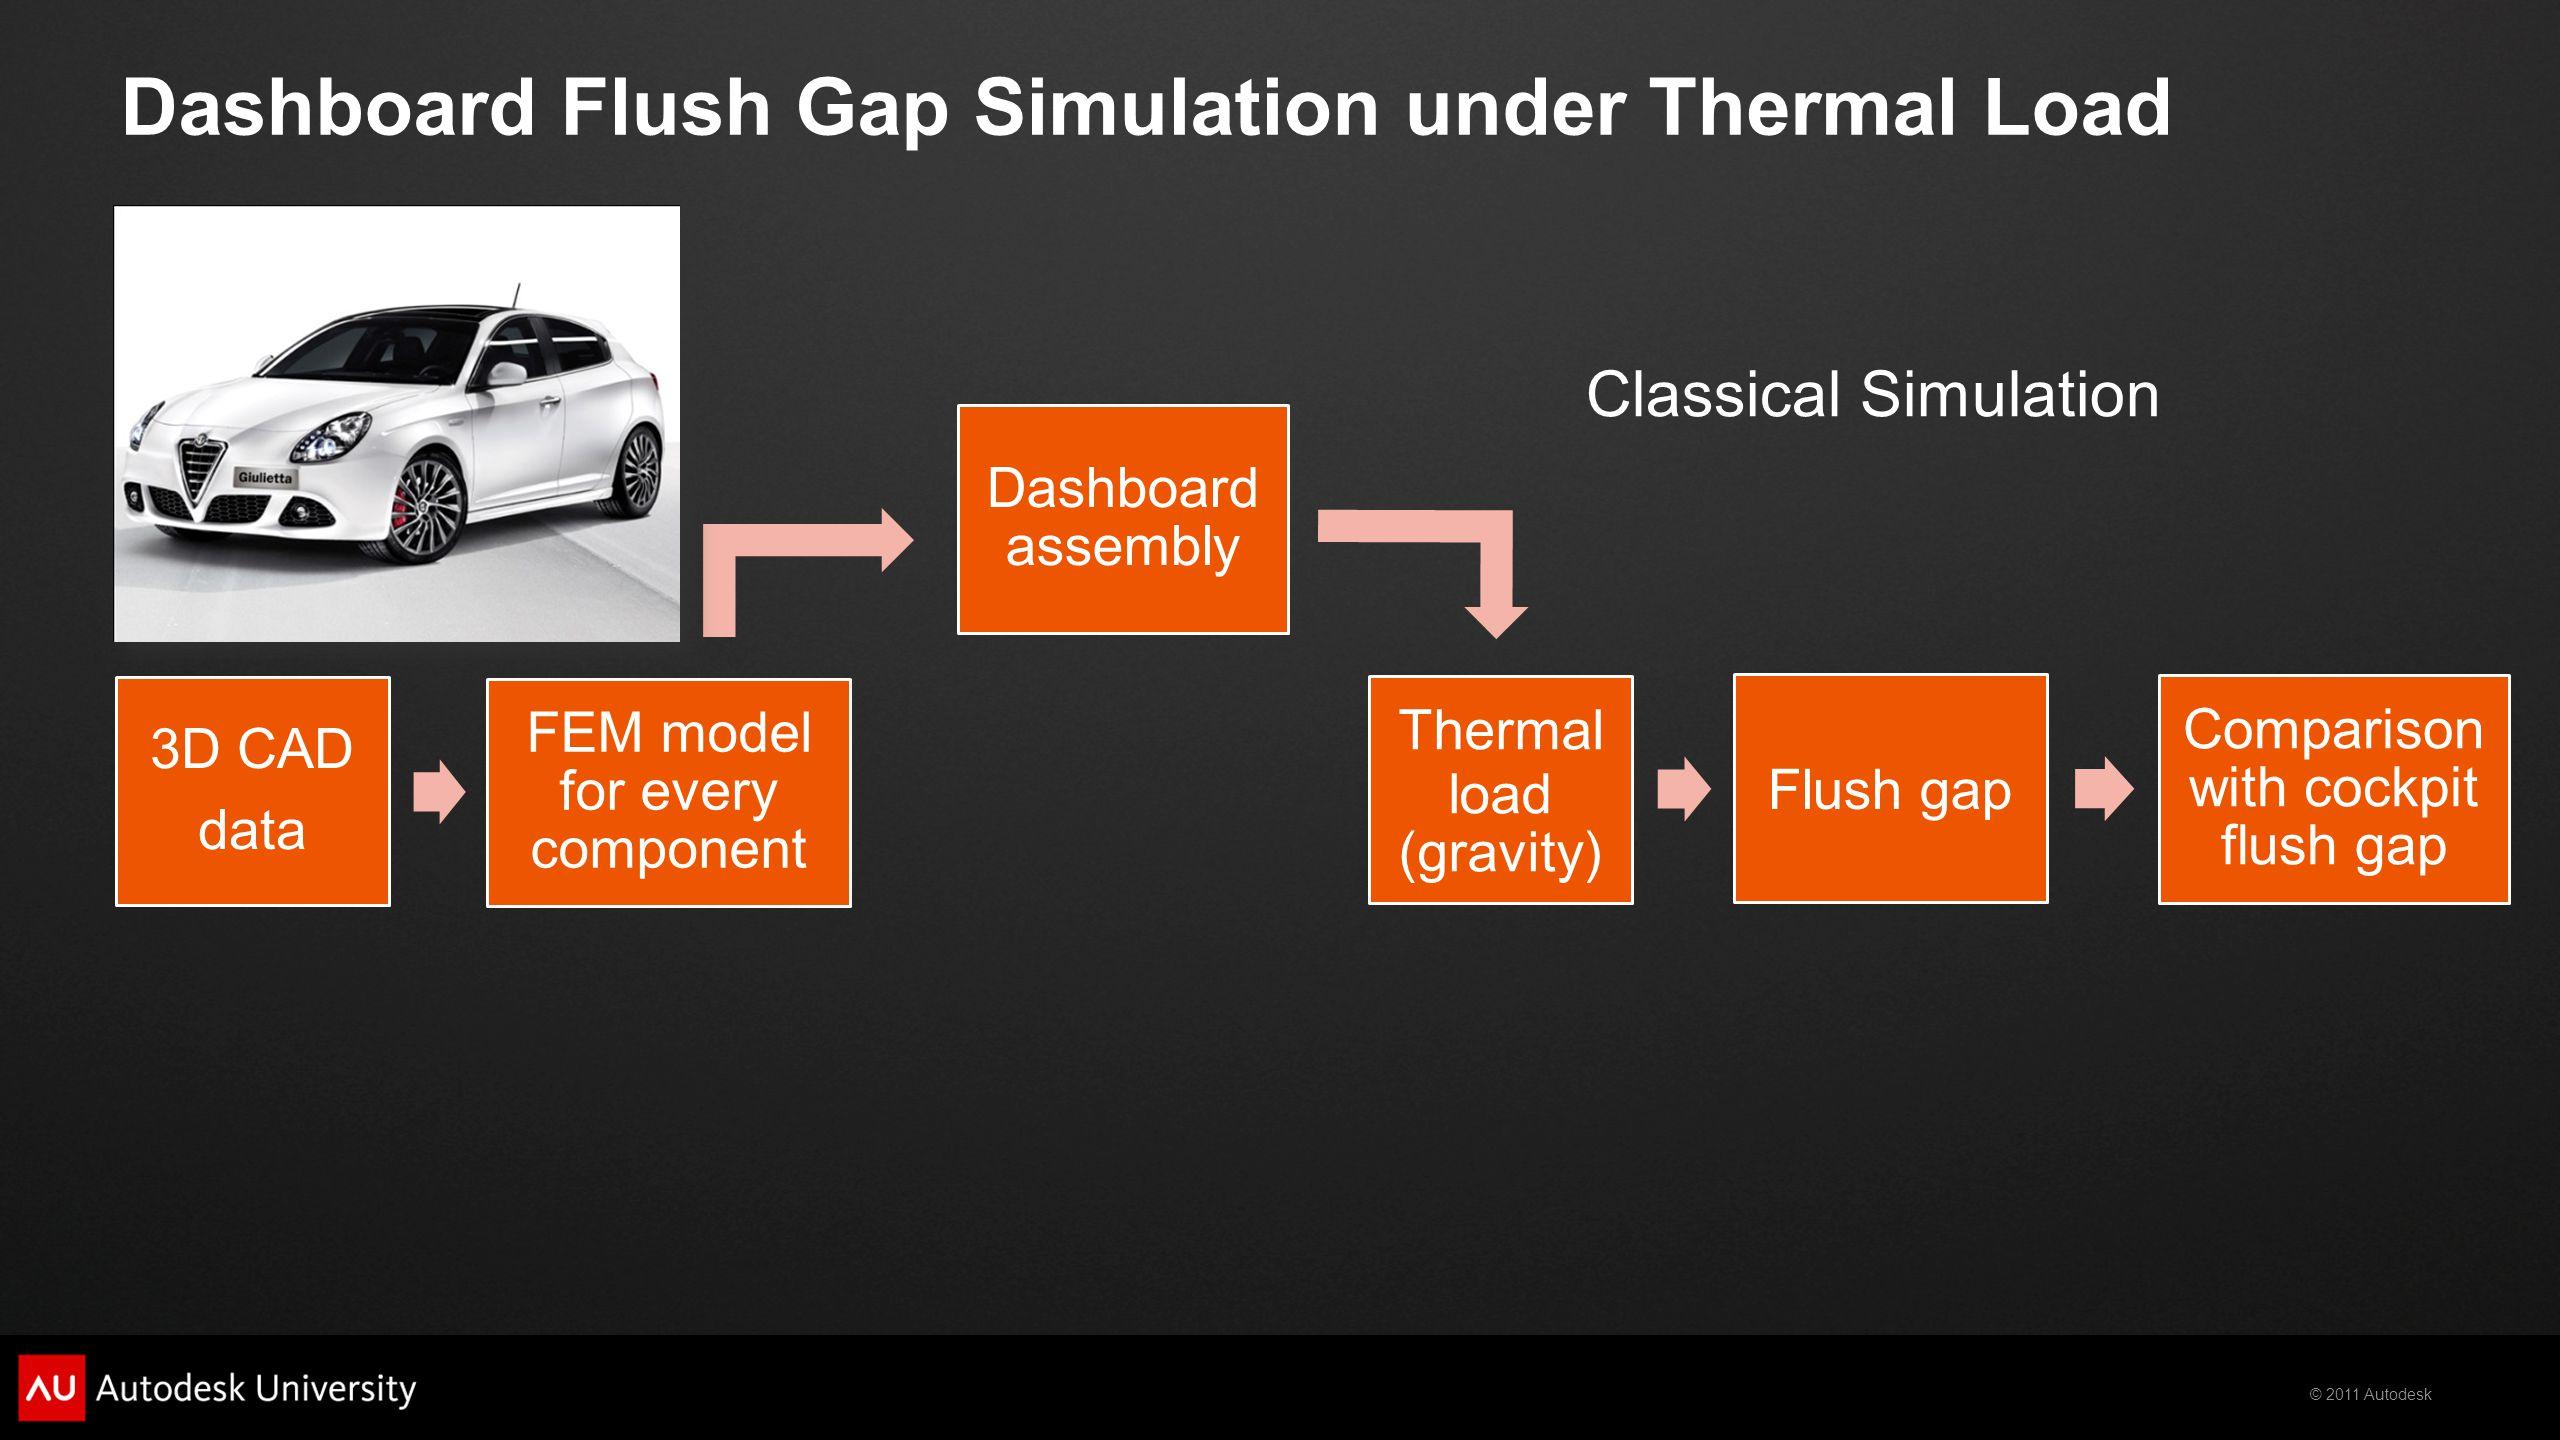 © 2011 Autodesk Dashboard Flush Gap Simulation under Thermal Load 3D CAD data FEM model for every component Dashboard assembly Thermal load (gravity) Flush gap Comparison with cockpit flush gap Classical Simulation